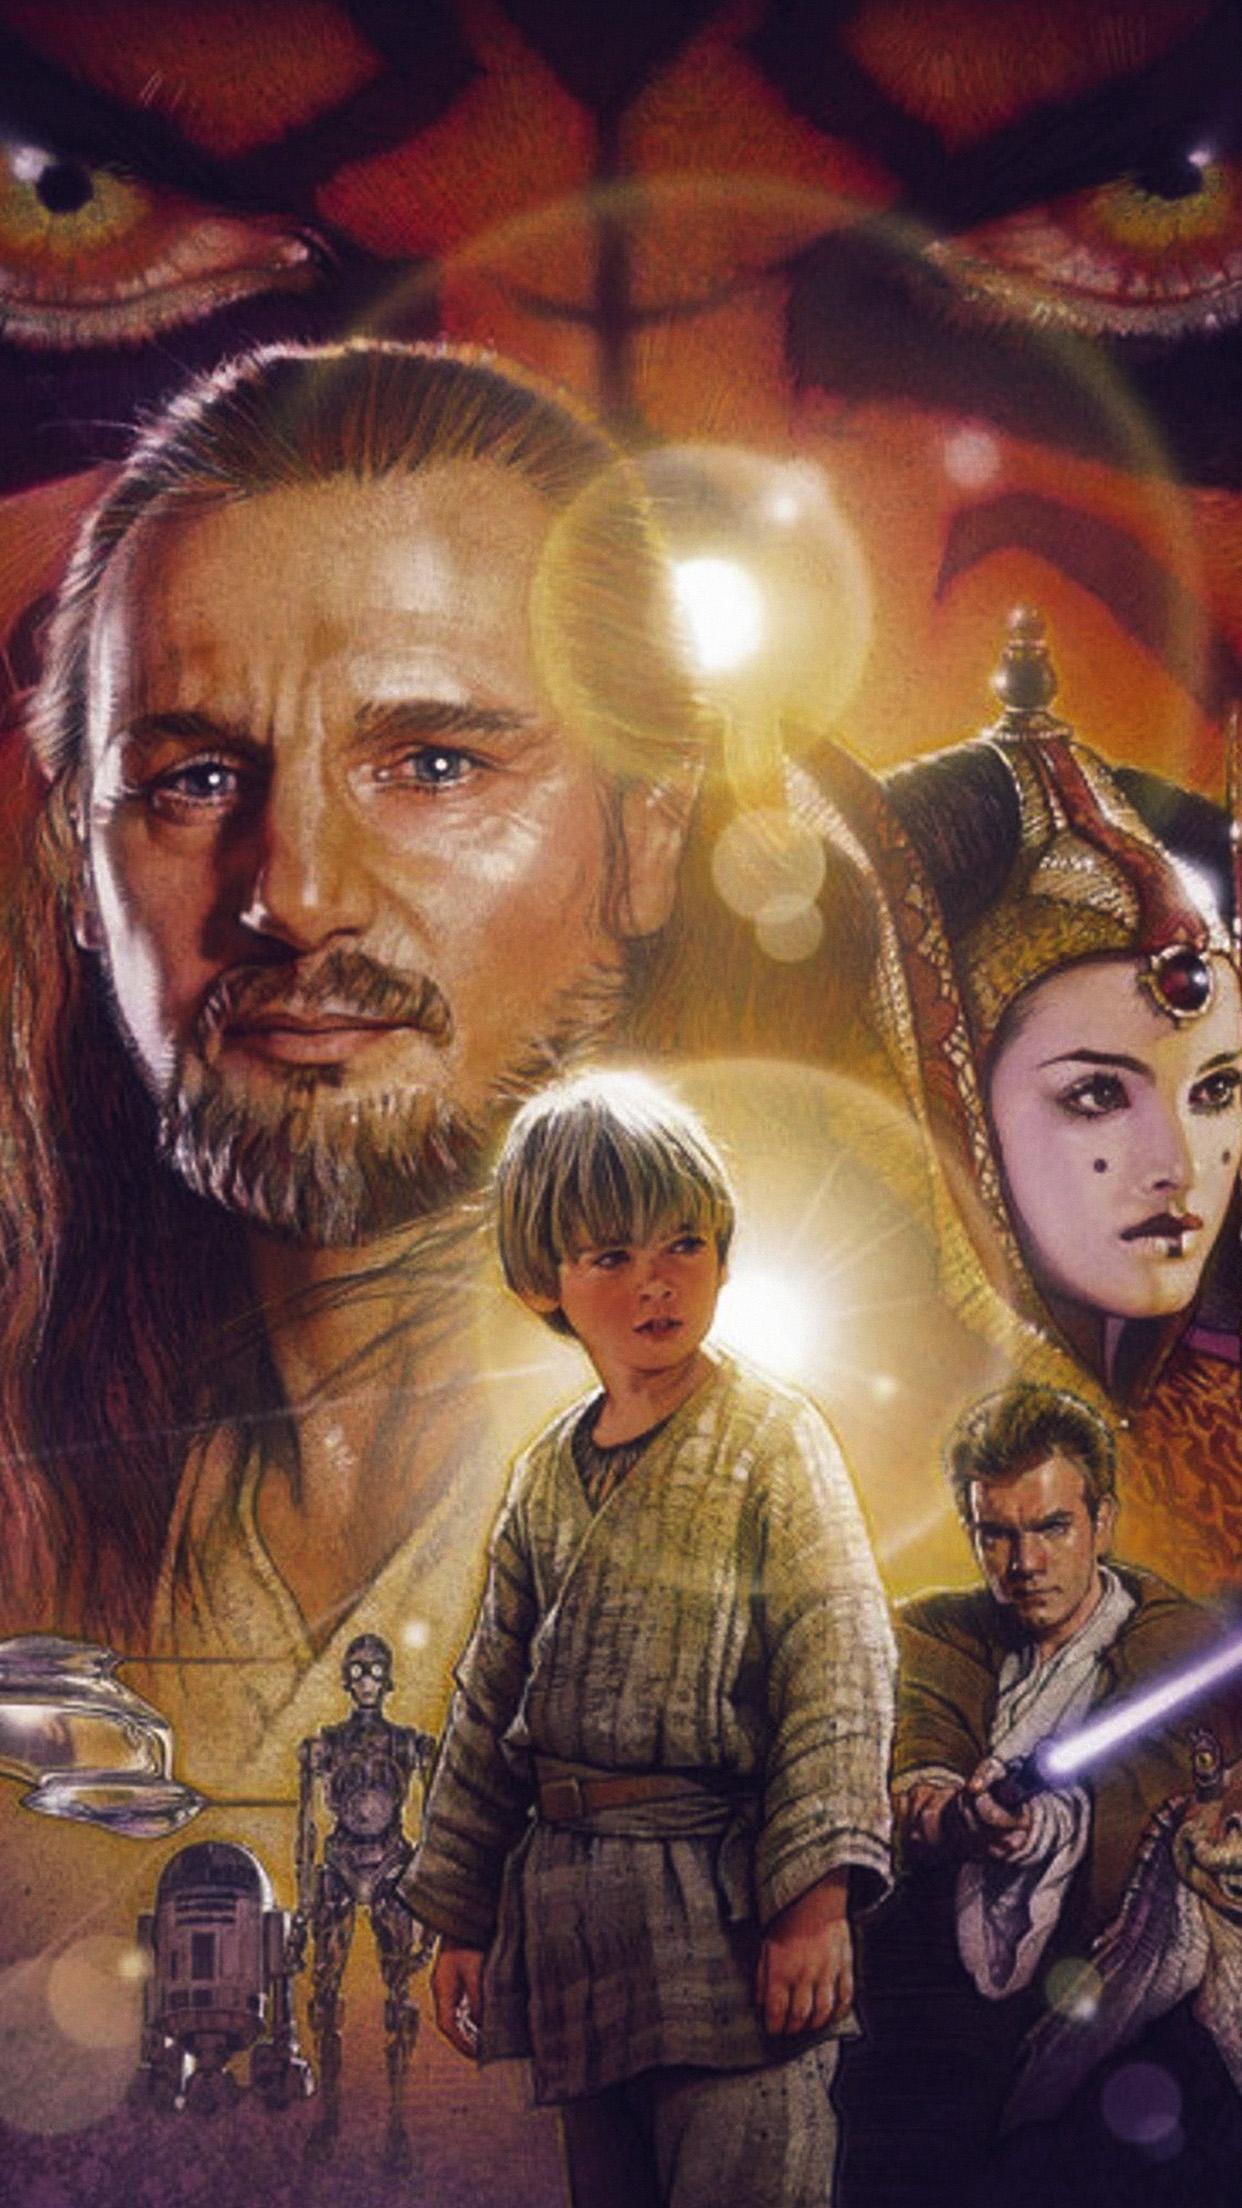 Lego Star Wars Iphone Wallpaper I Love Papers Ao44 Starwars Episode 1 Art Illust Poster Film